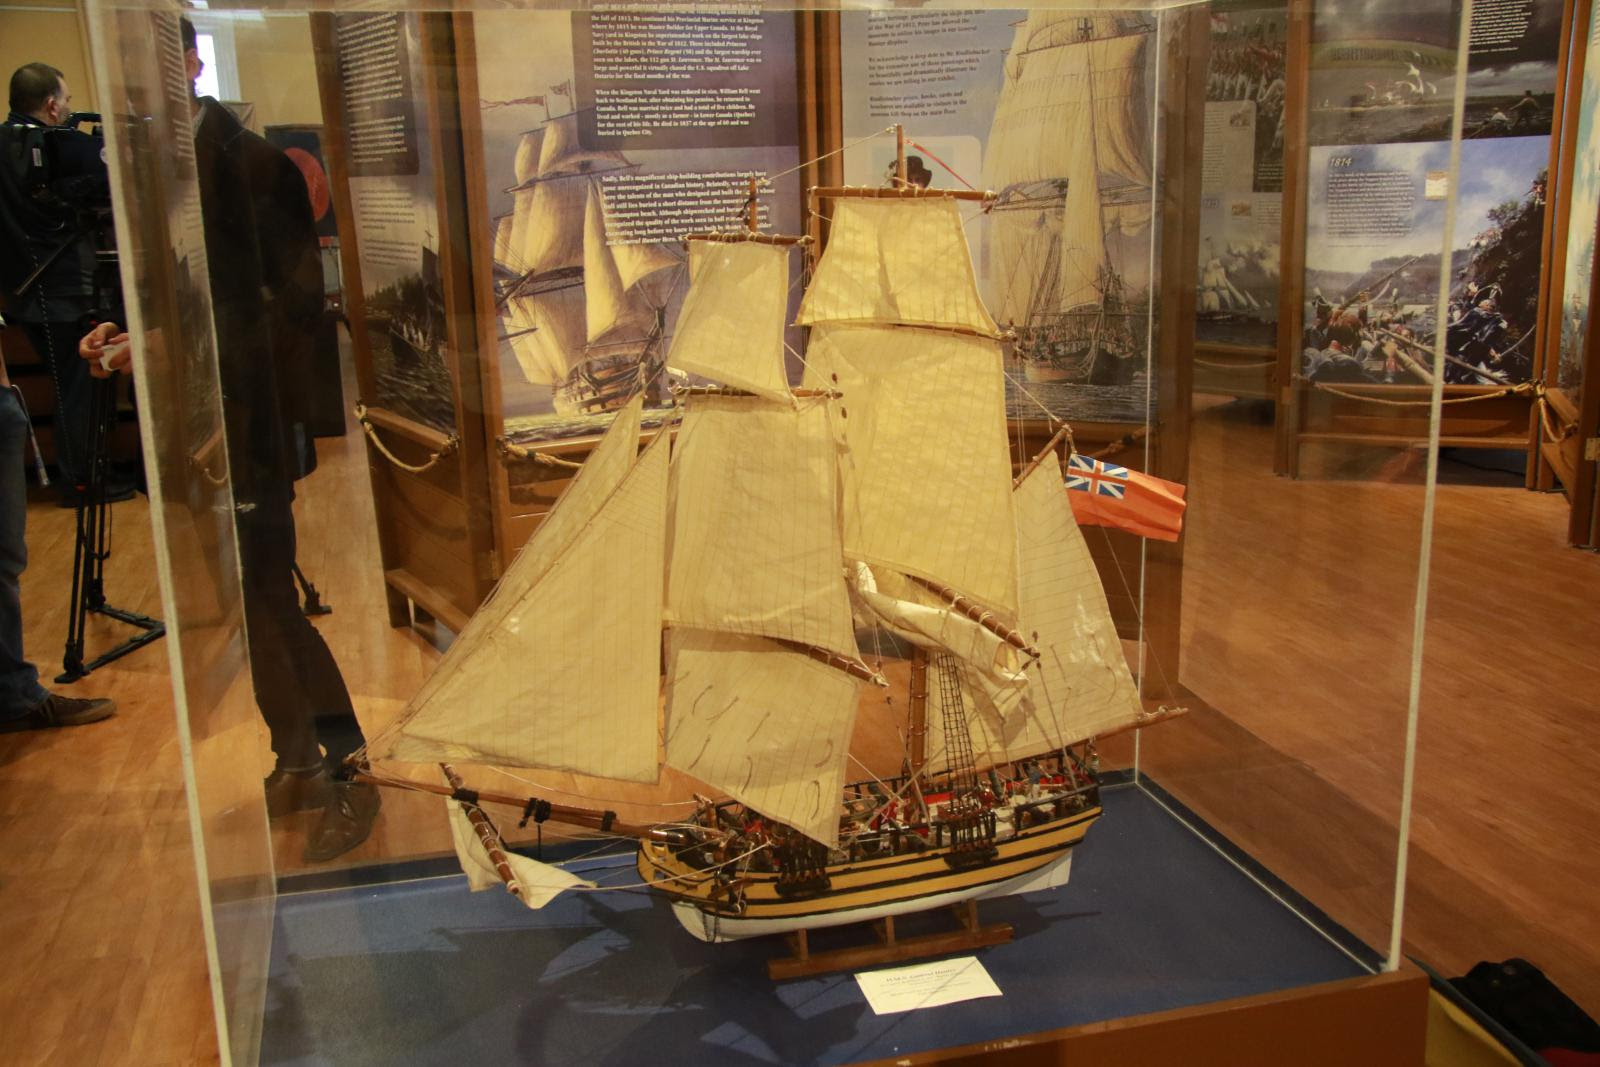 High-tech exhibit brings War of 1812 brig to life